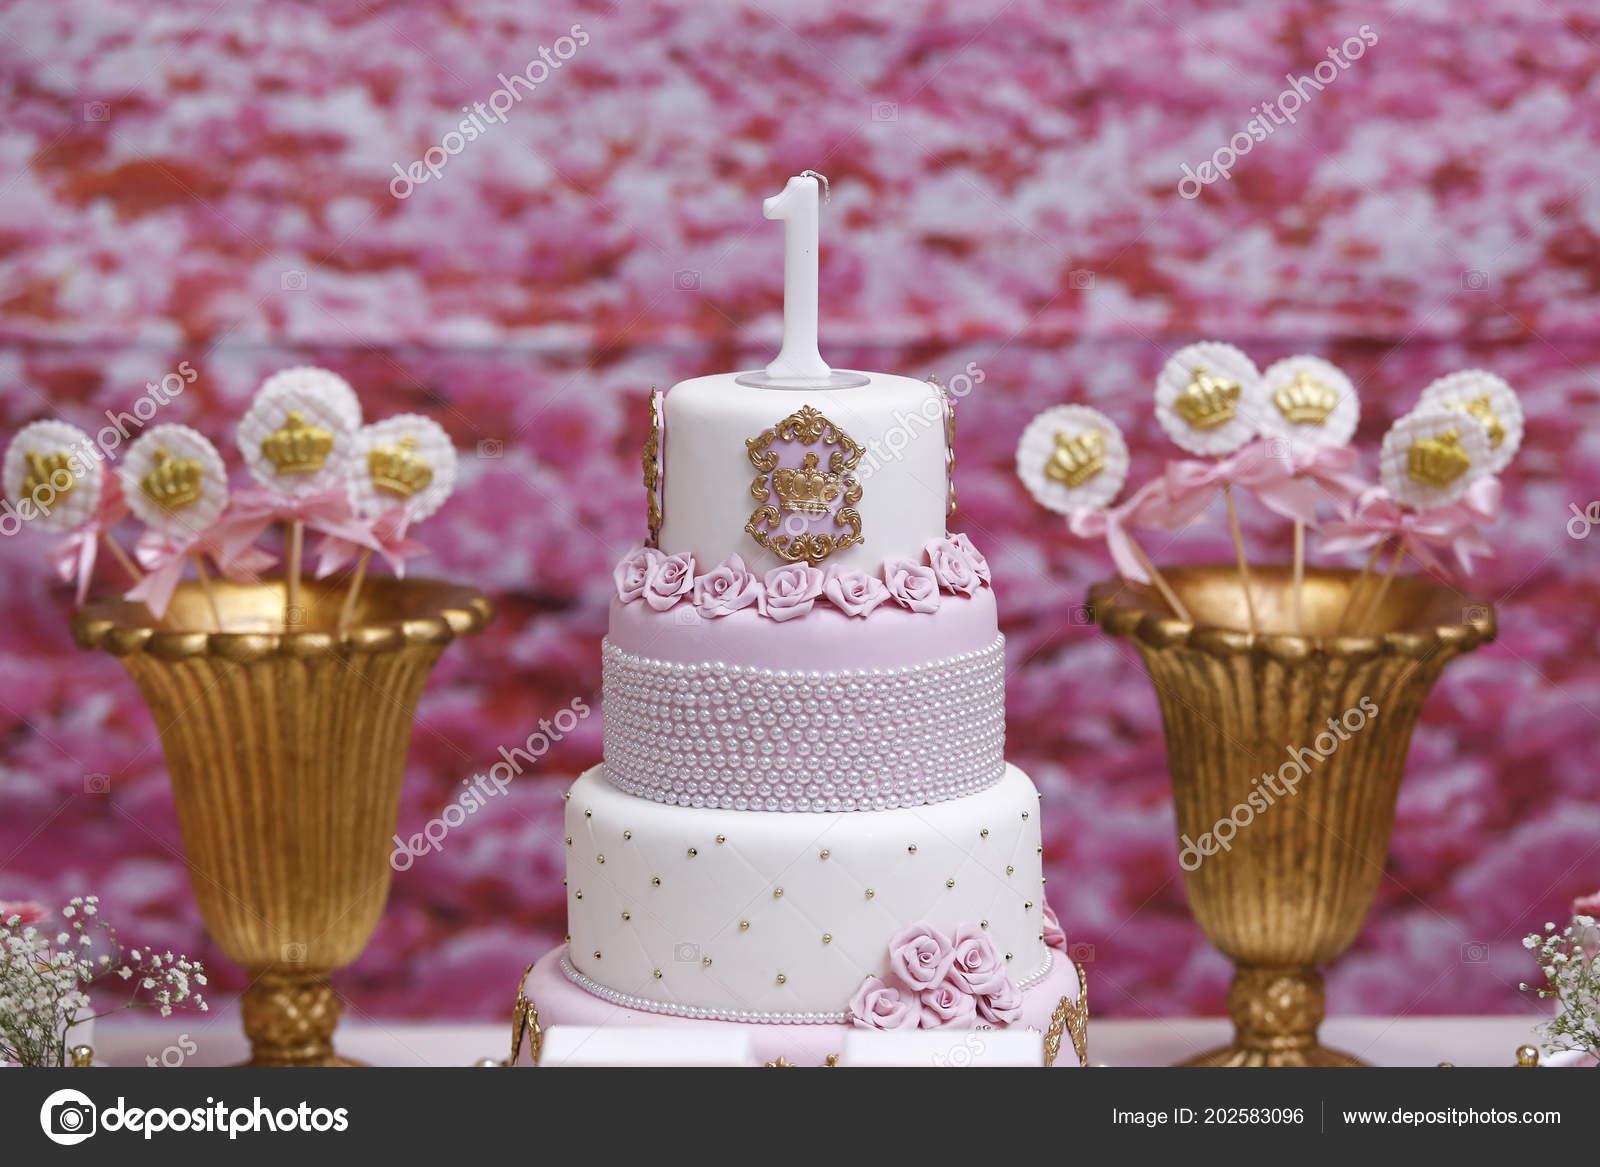 Superb Pictures Celebration Of Life Cakes Birthday Cake Celebration Funny Birthday Cards Online Inifodamsfinfo